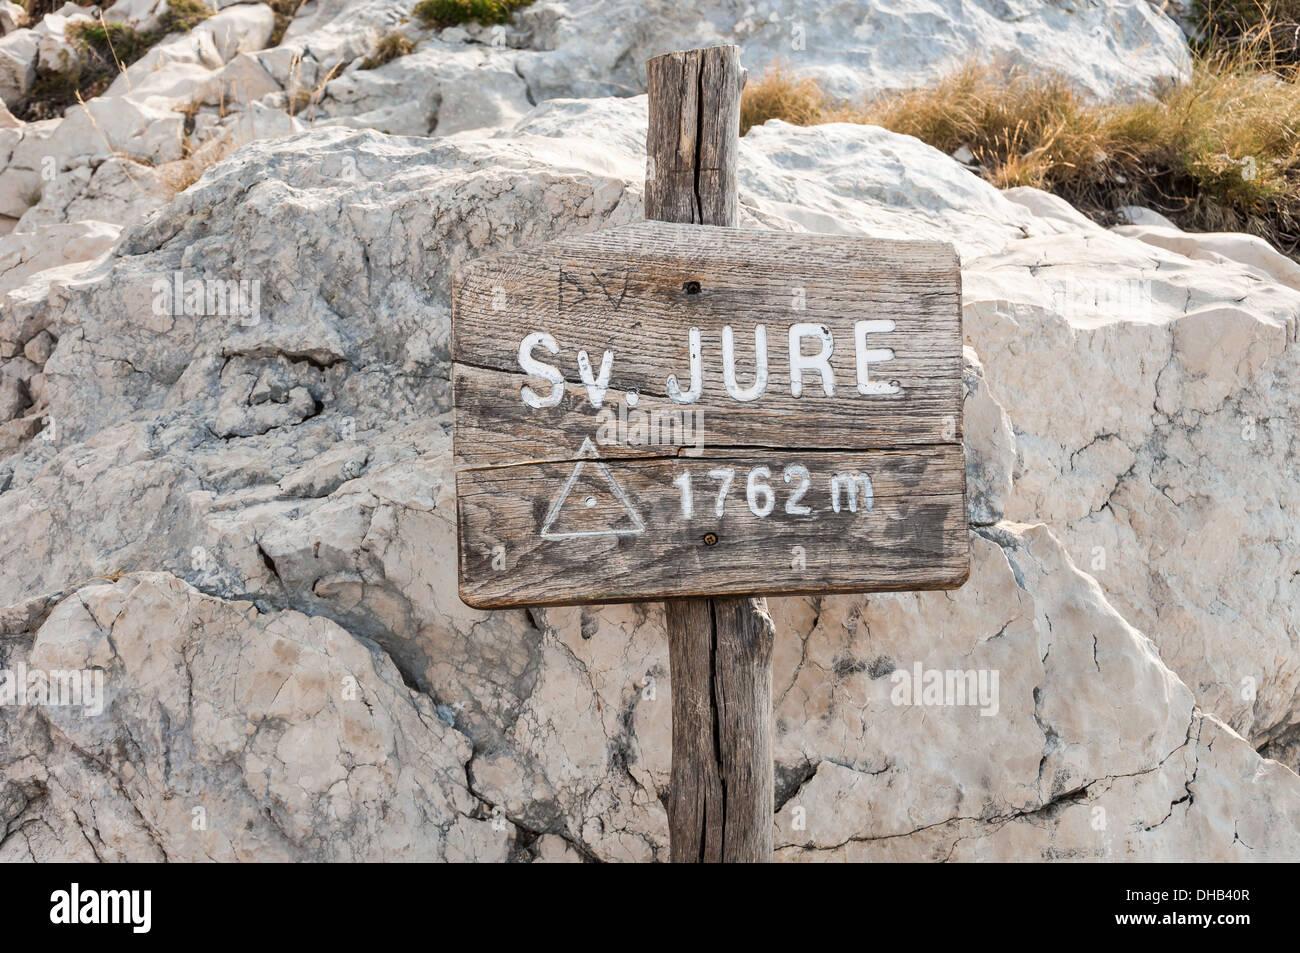 Sv. Jure peak sign in Biokovo mountains, Croatia. - Stock Image